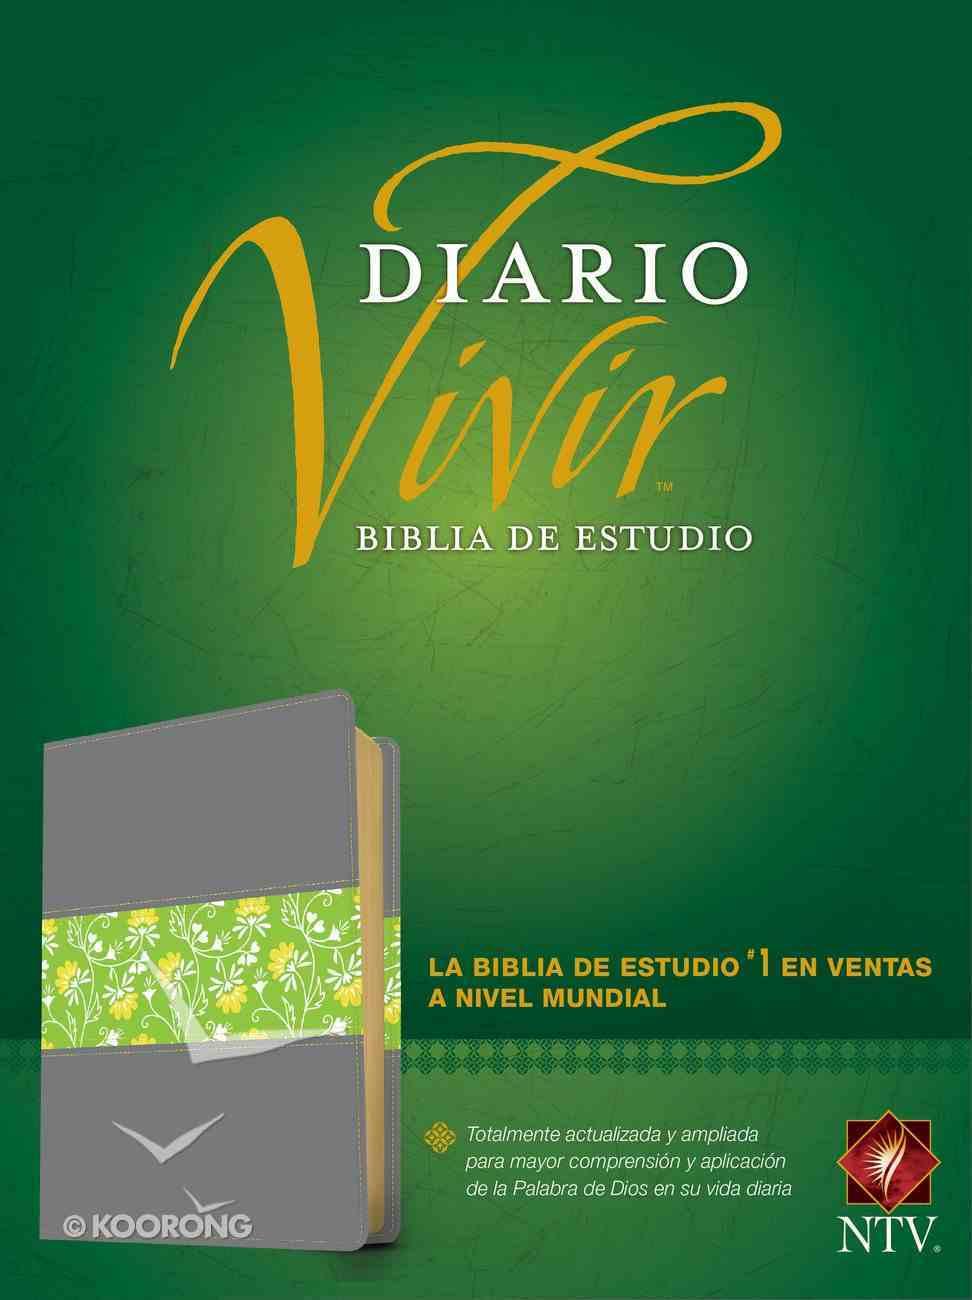 Ntv Biblia De Estudio Del Diario Vivir Gray/Green (Red Letter Edition) Imitation Leather